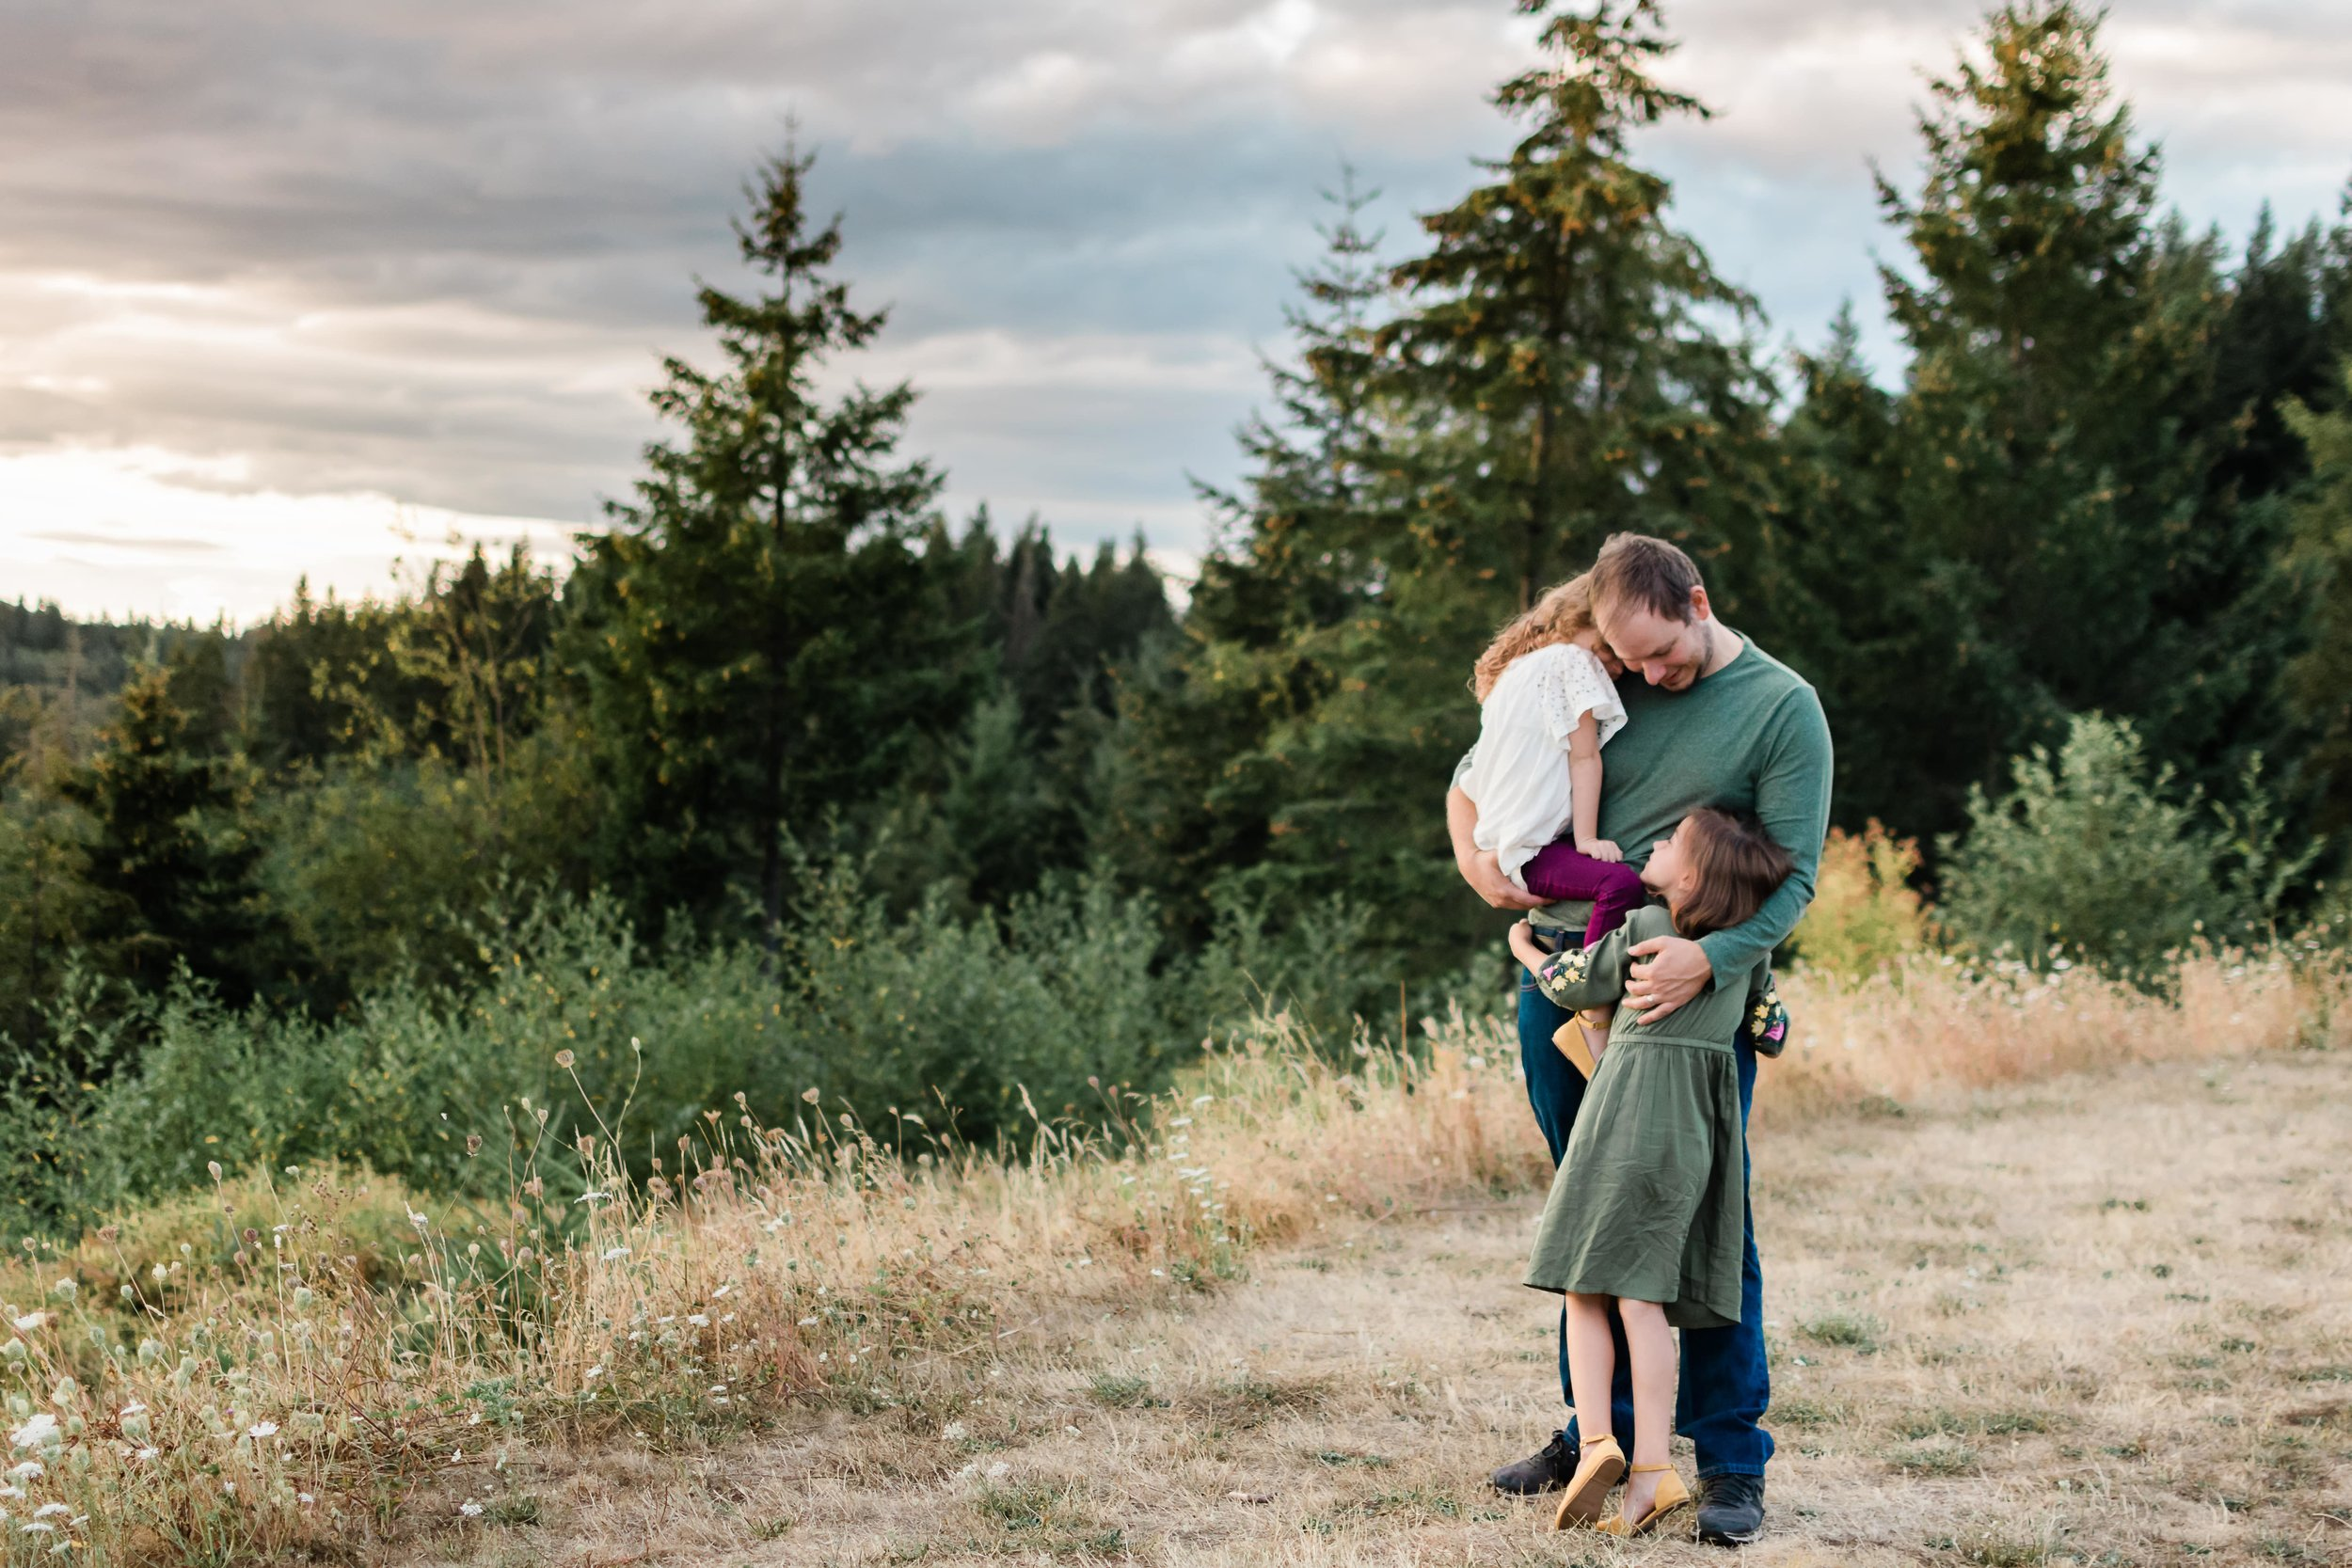 Outdoor Family Photography in Portland, Oregon by Elizabeth Hite